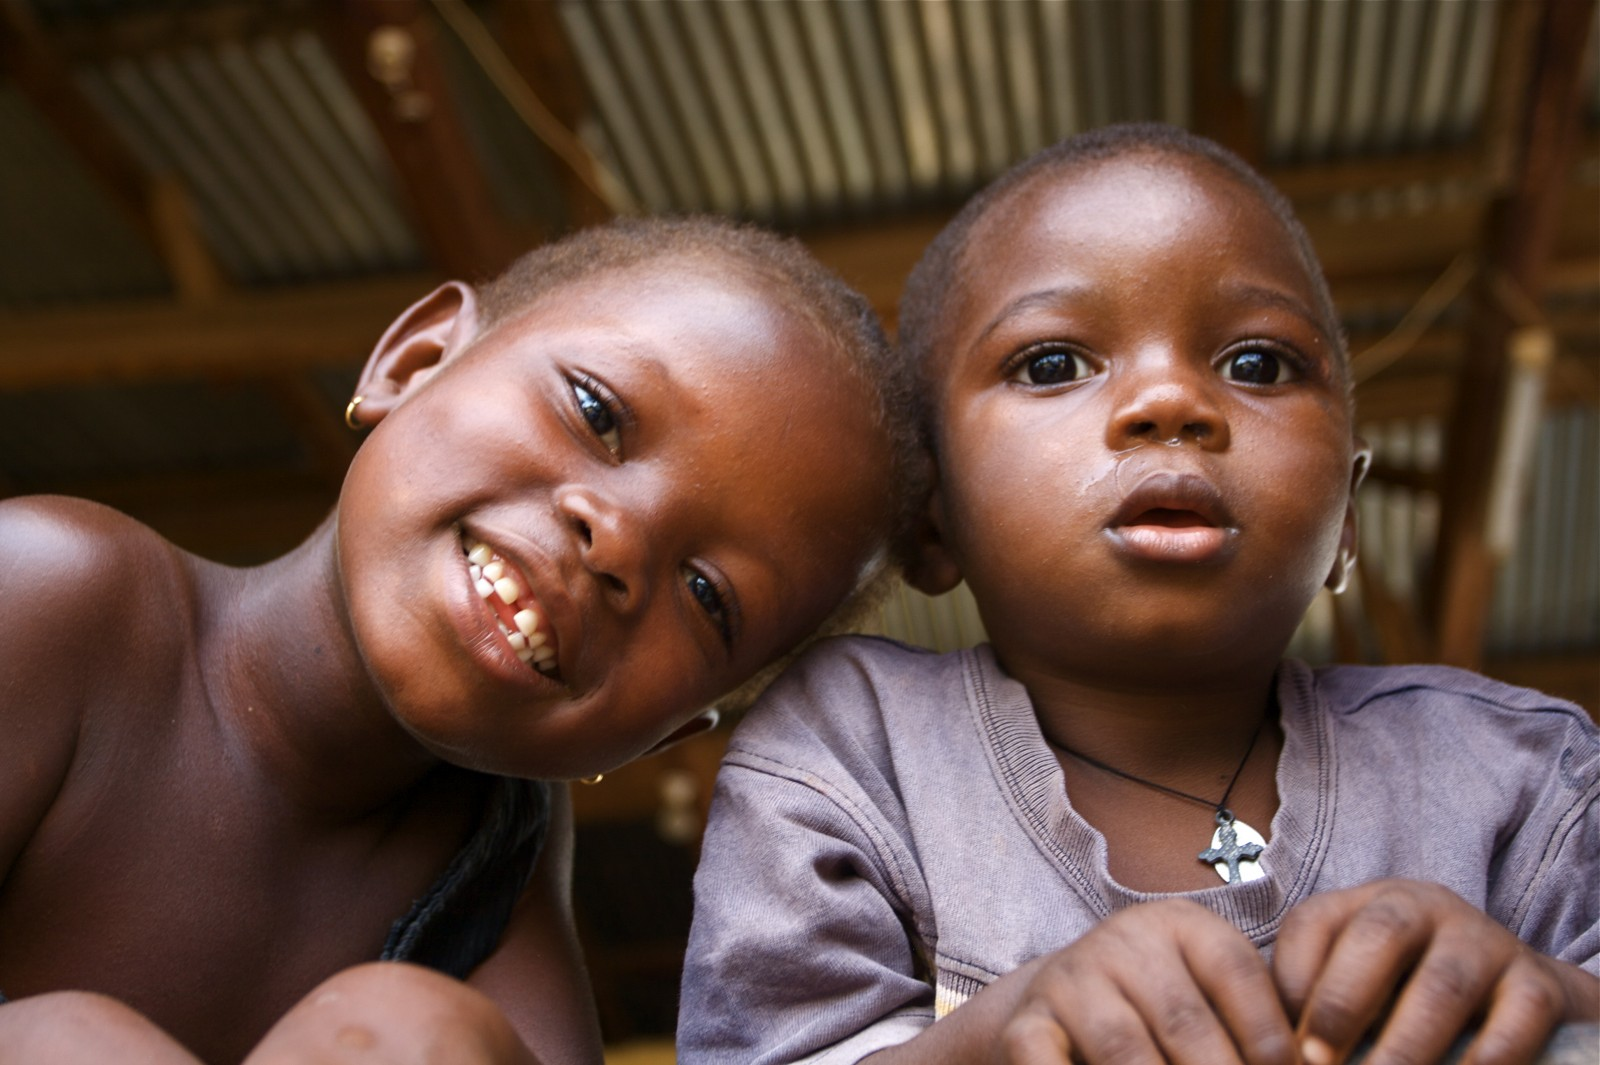 Child Africa